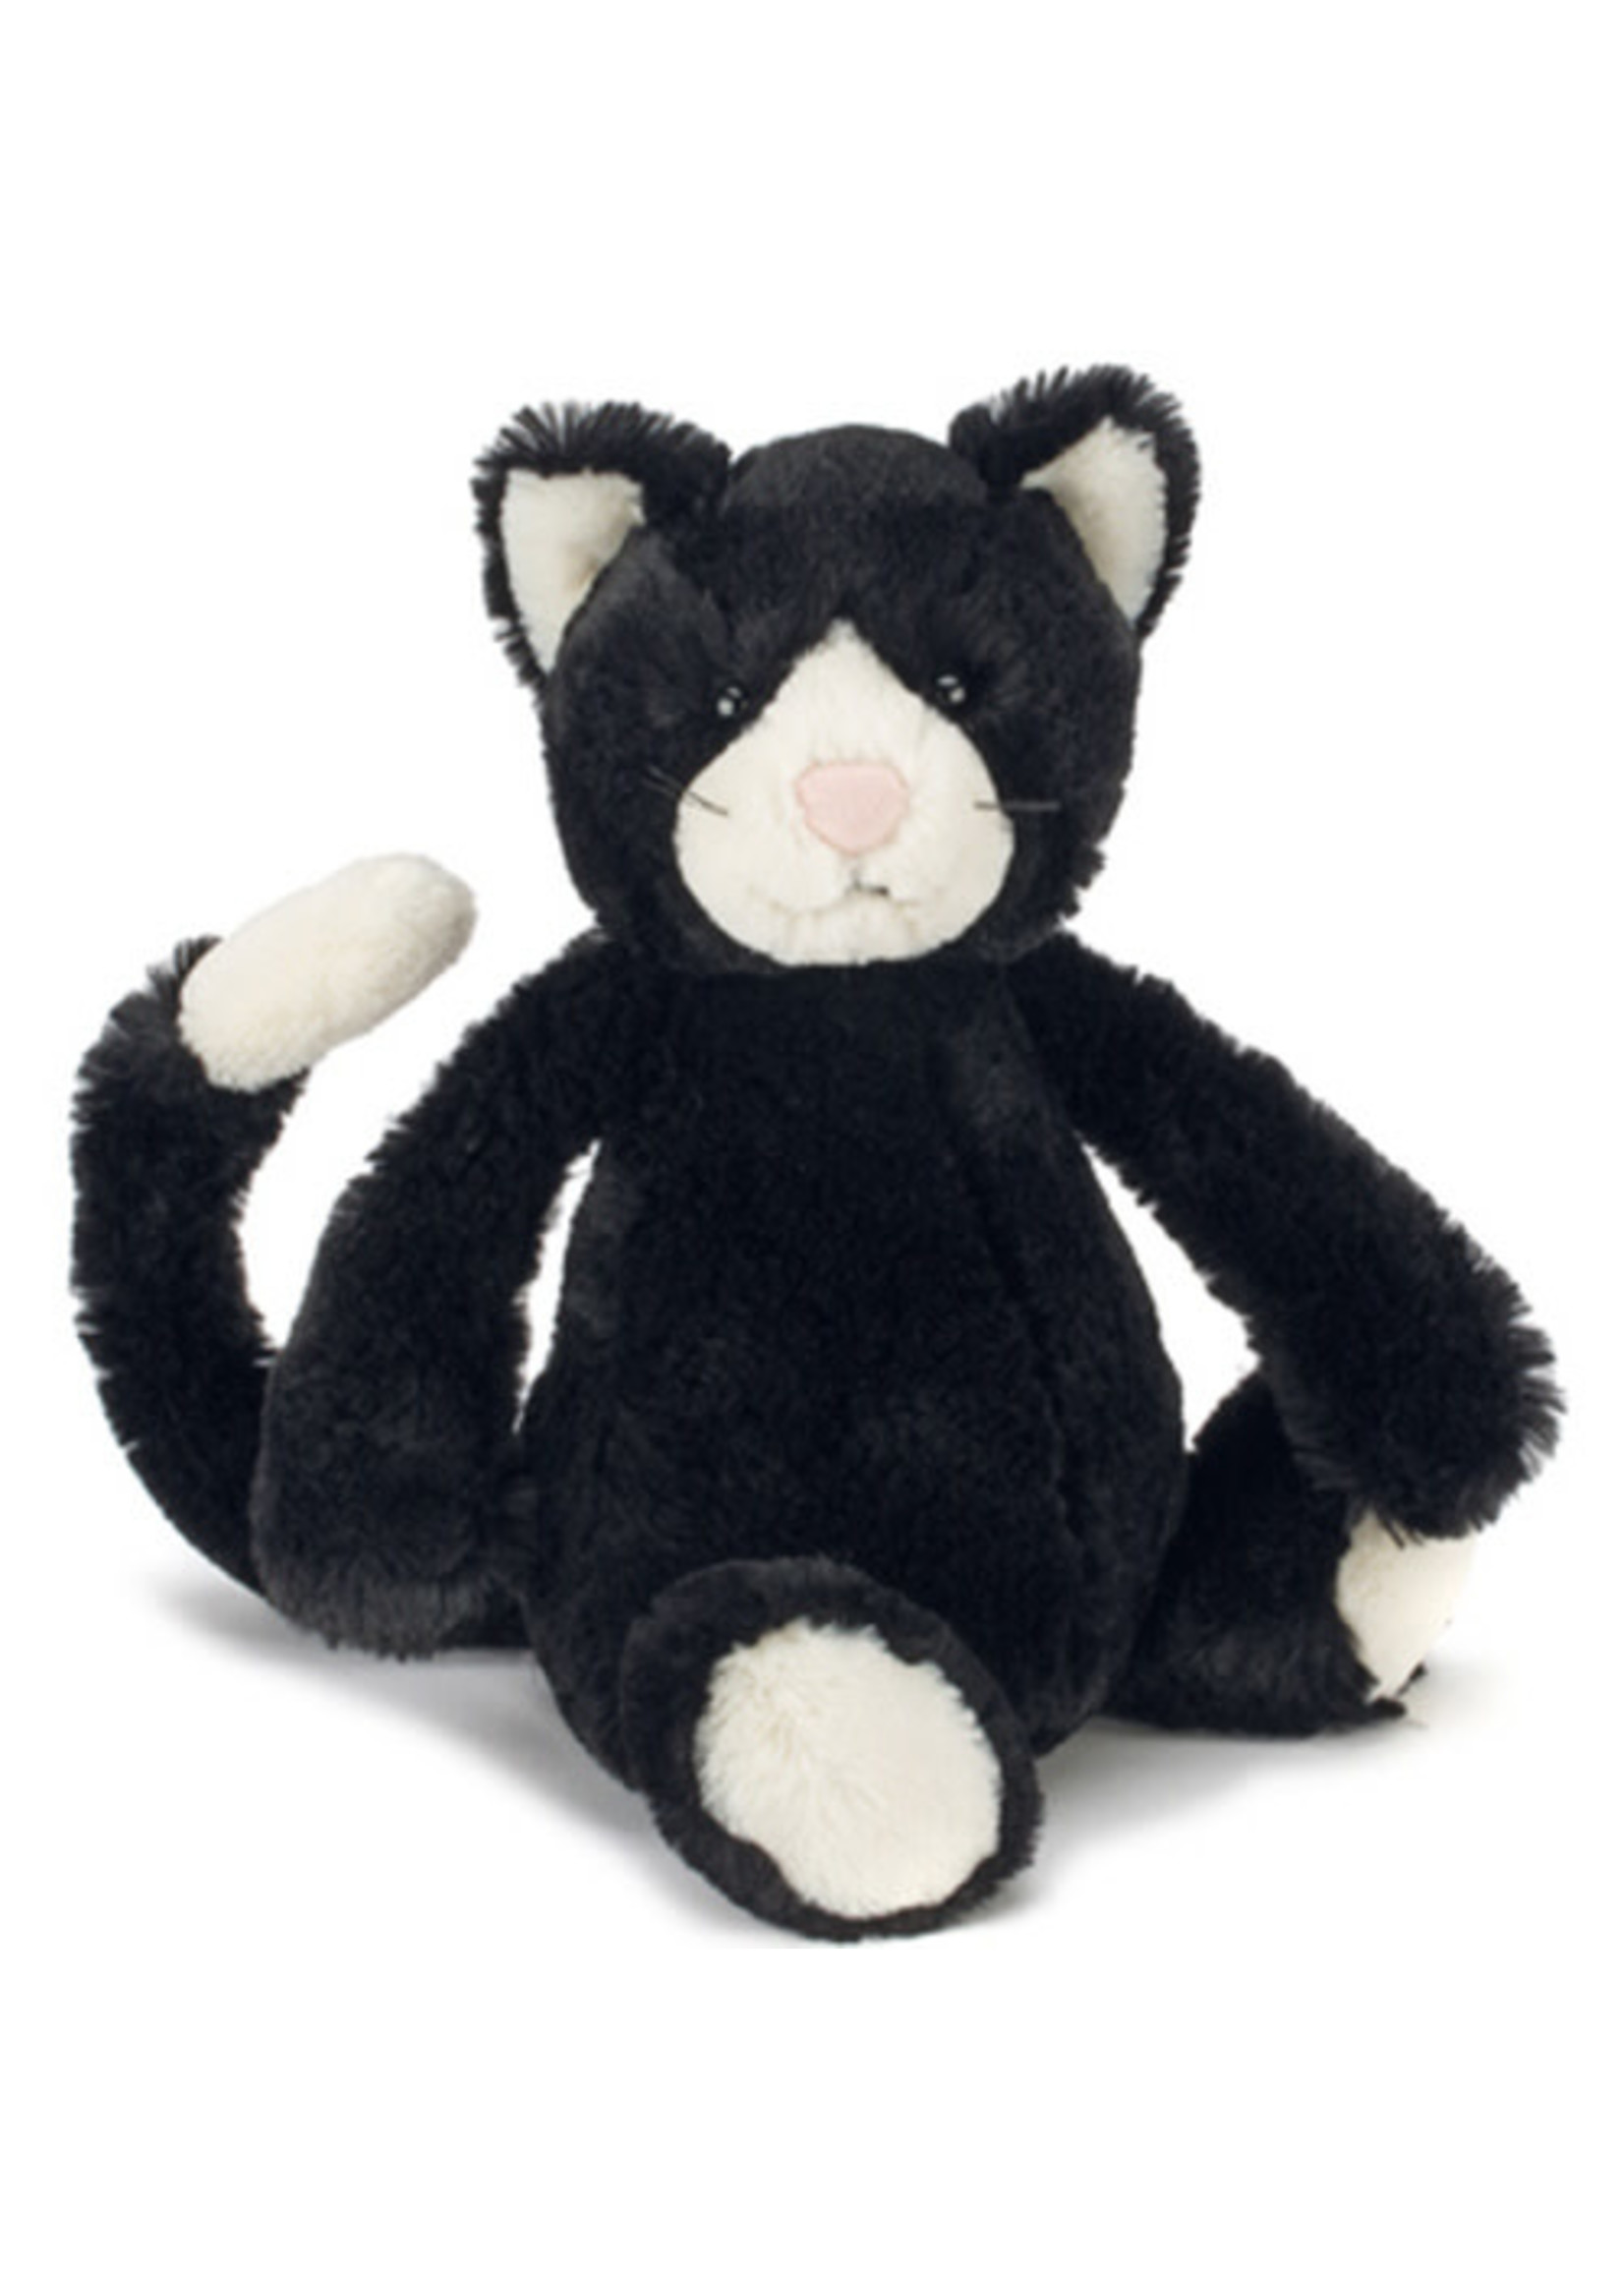 Jellycat JC Medium Bashful Black & White Cat